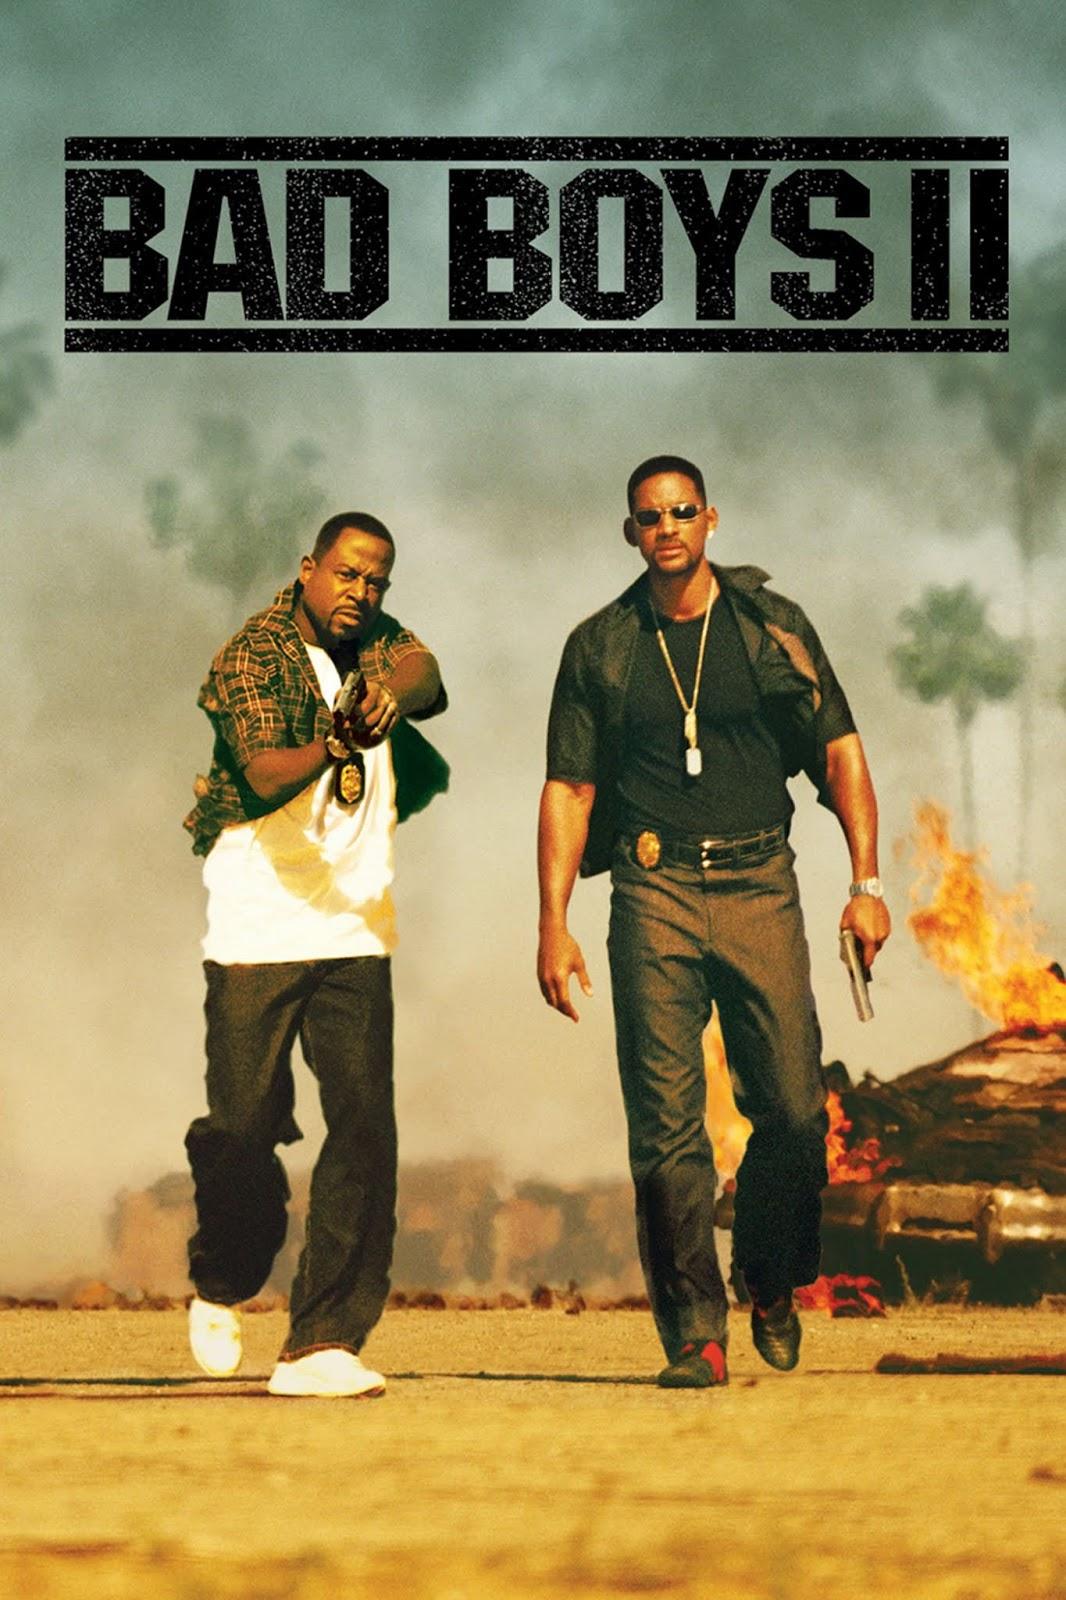 BAD BOYS 2 (2003) MOVIE TAMIL DUBBED HD